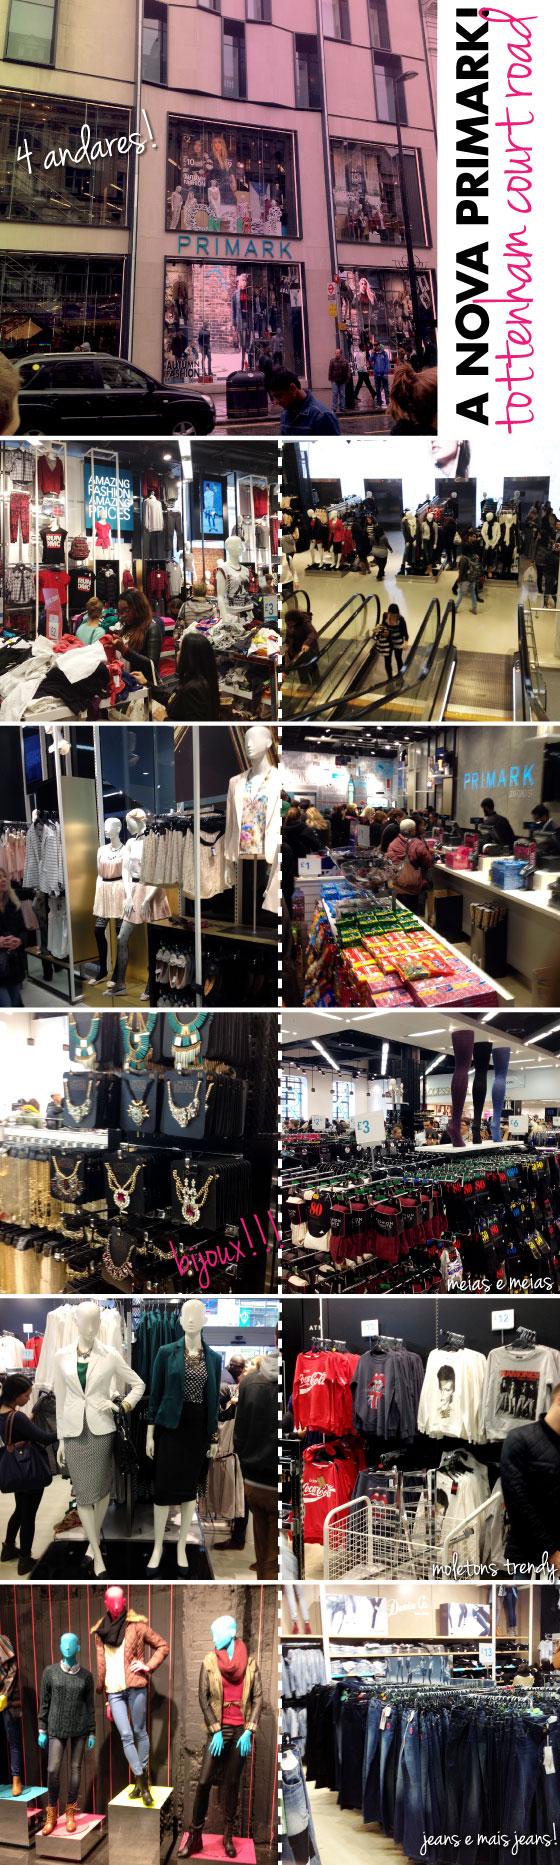 nova-loja-primark-tottenham-court-road-oxford-steet-flagship-endereco-fotos-londres-london